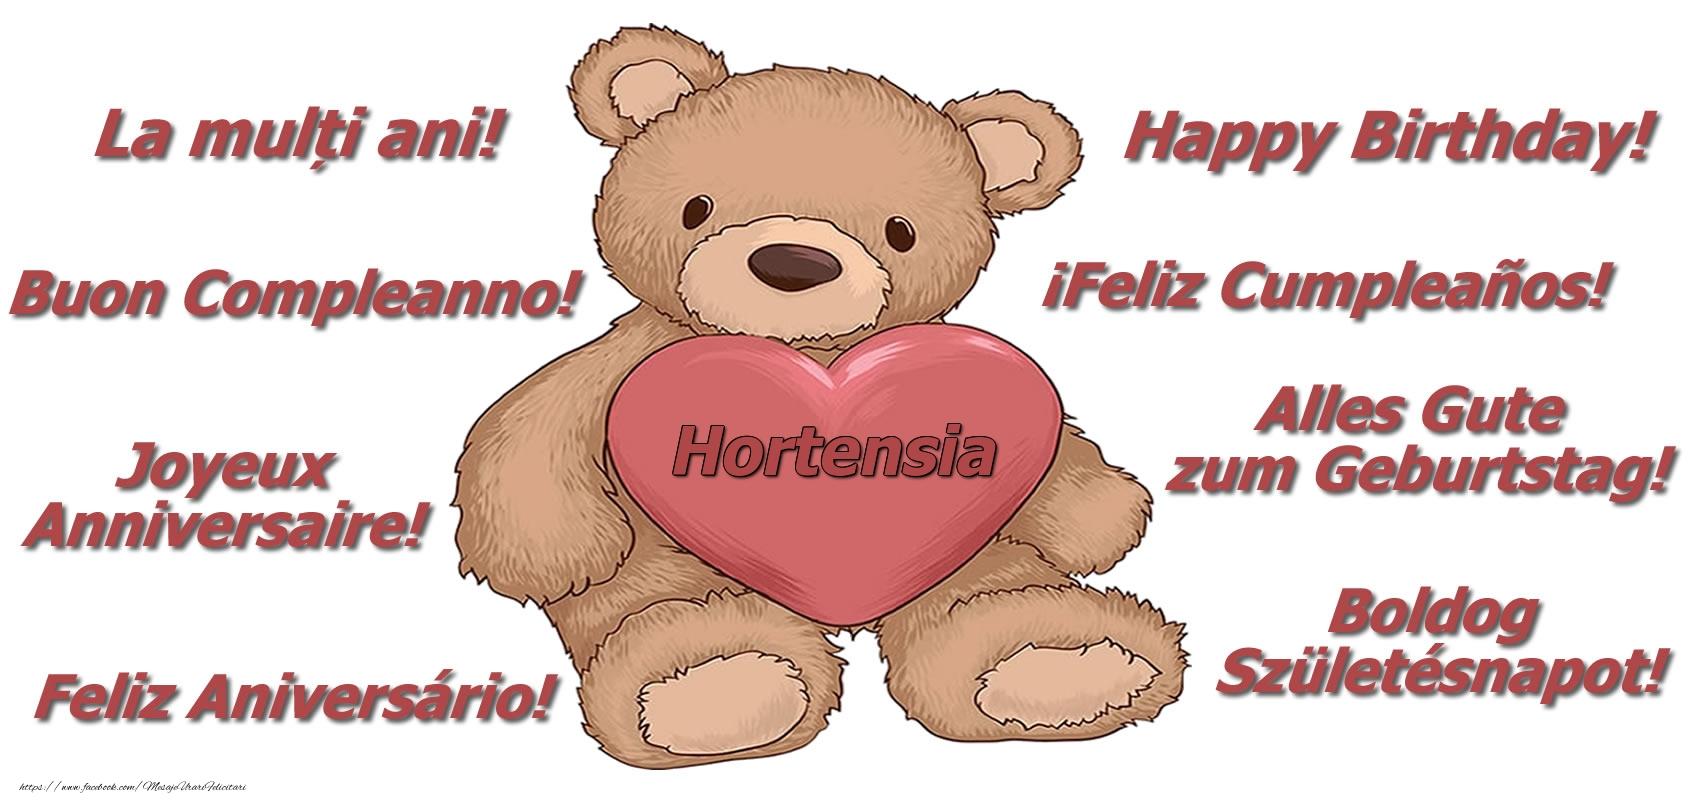 Felicitari de zi de nastere - La multi ani Hortensia! - Ursulet